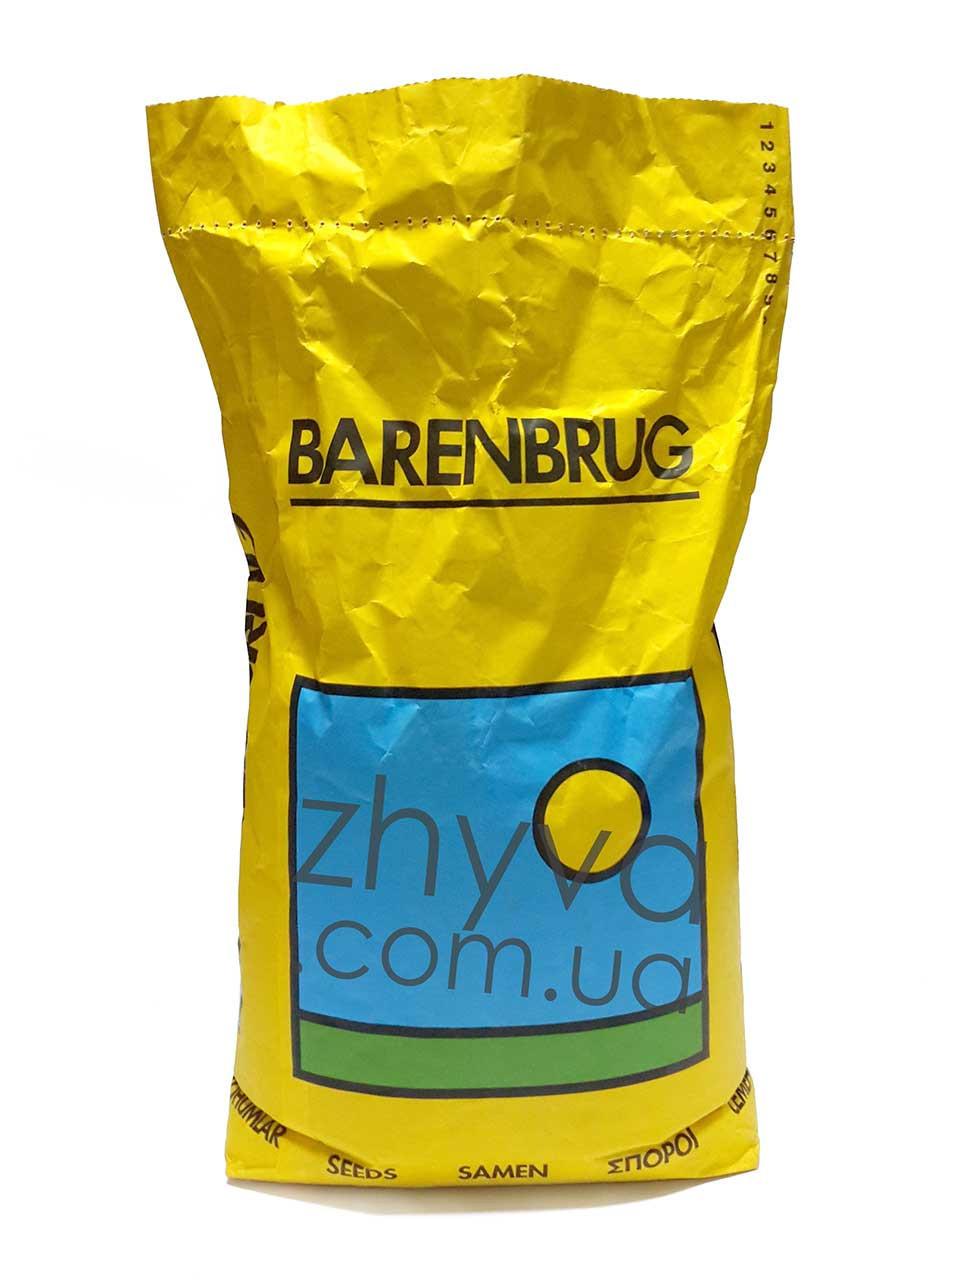 Газонная трава теневая (Shadow) BARENBRUG (Голландия) 5кг